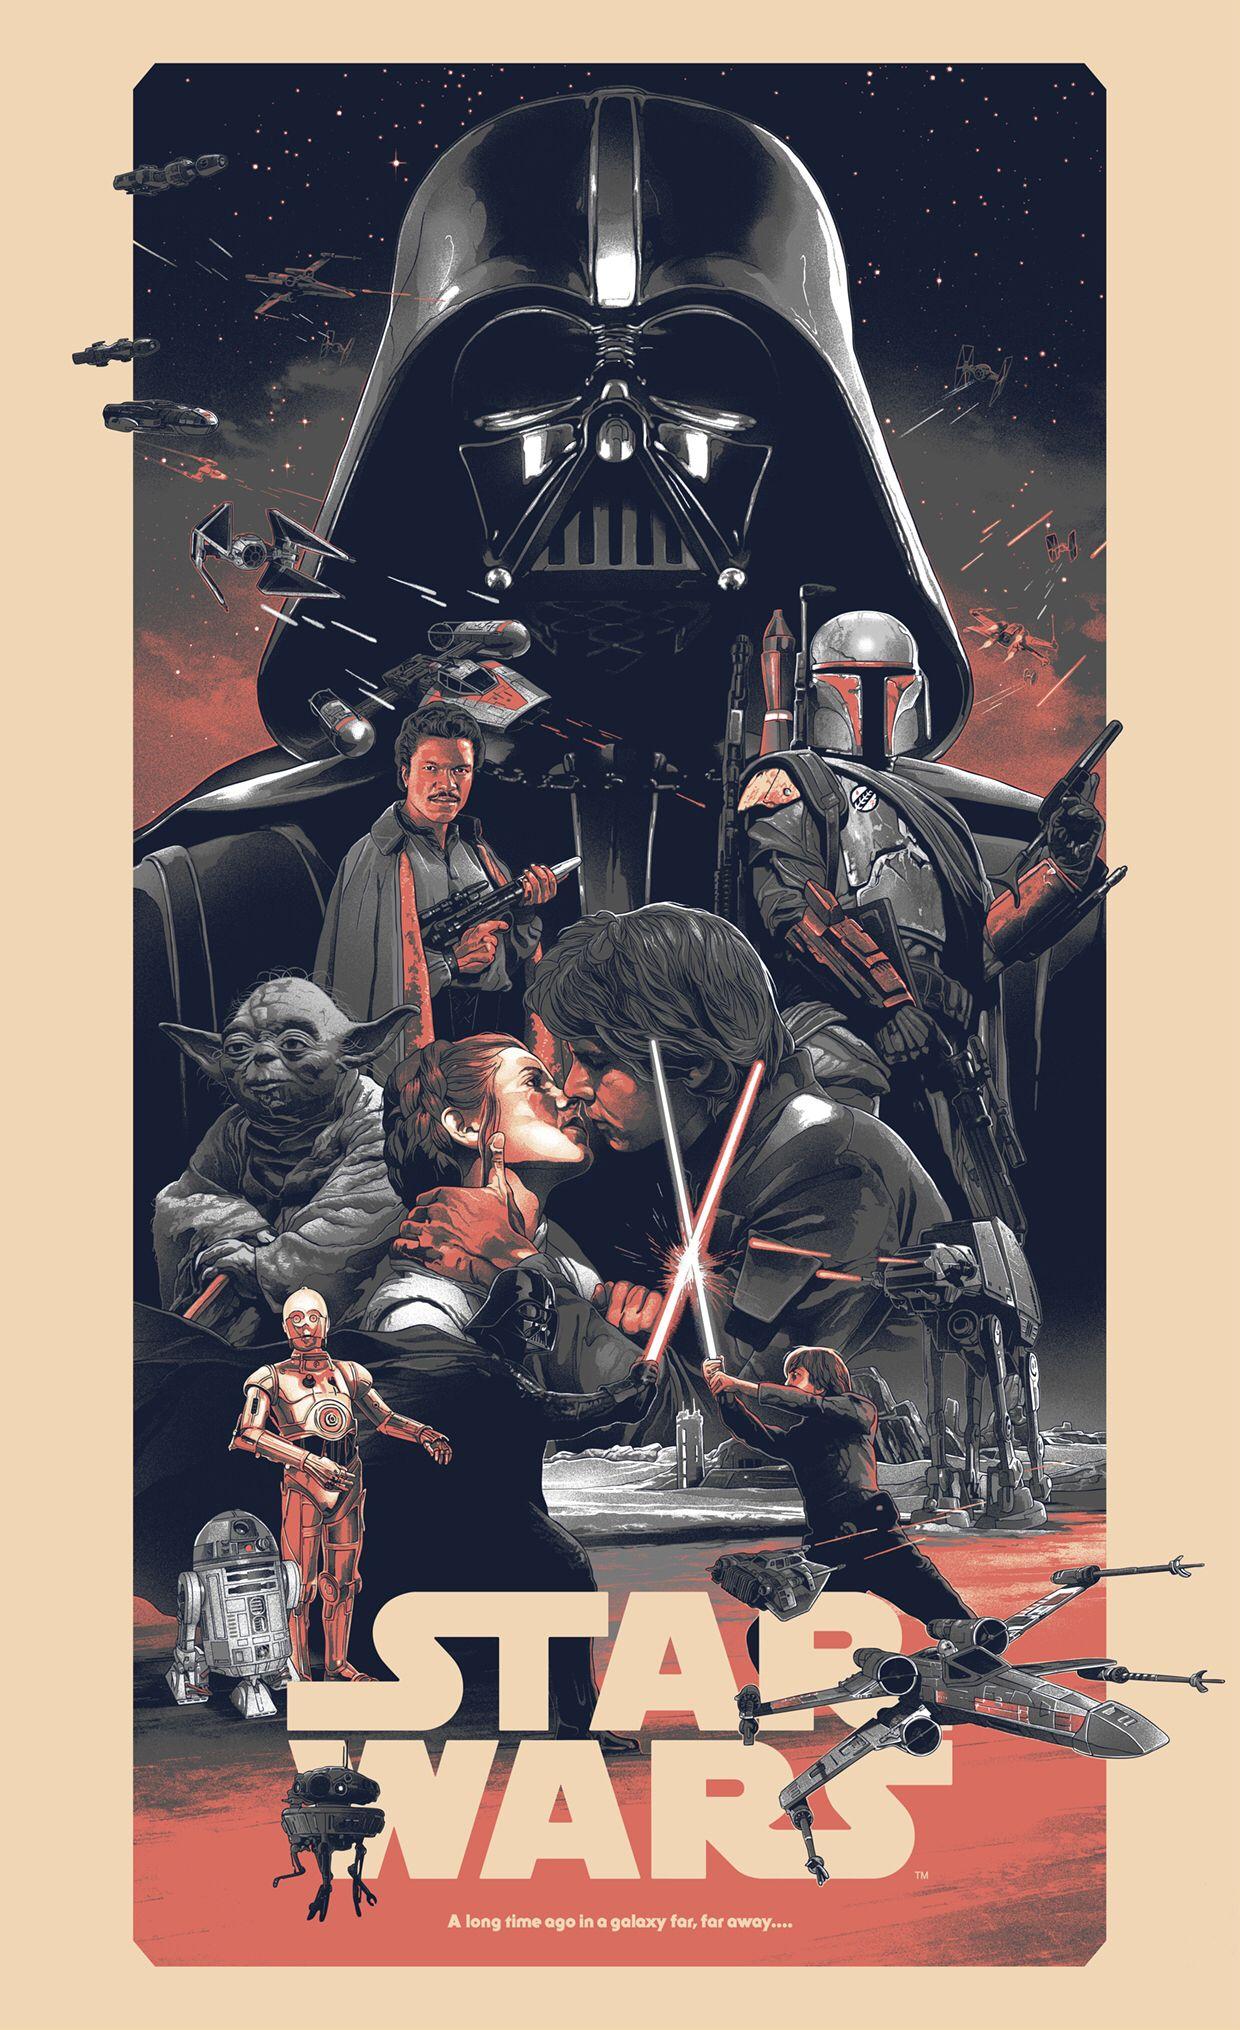 Pin de R. Ramos en Graphics Design | Pinterest | Dibujos star wars ...